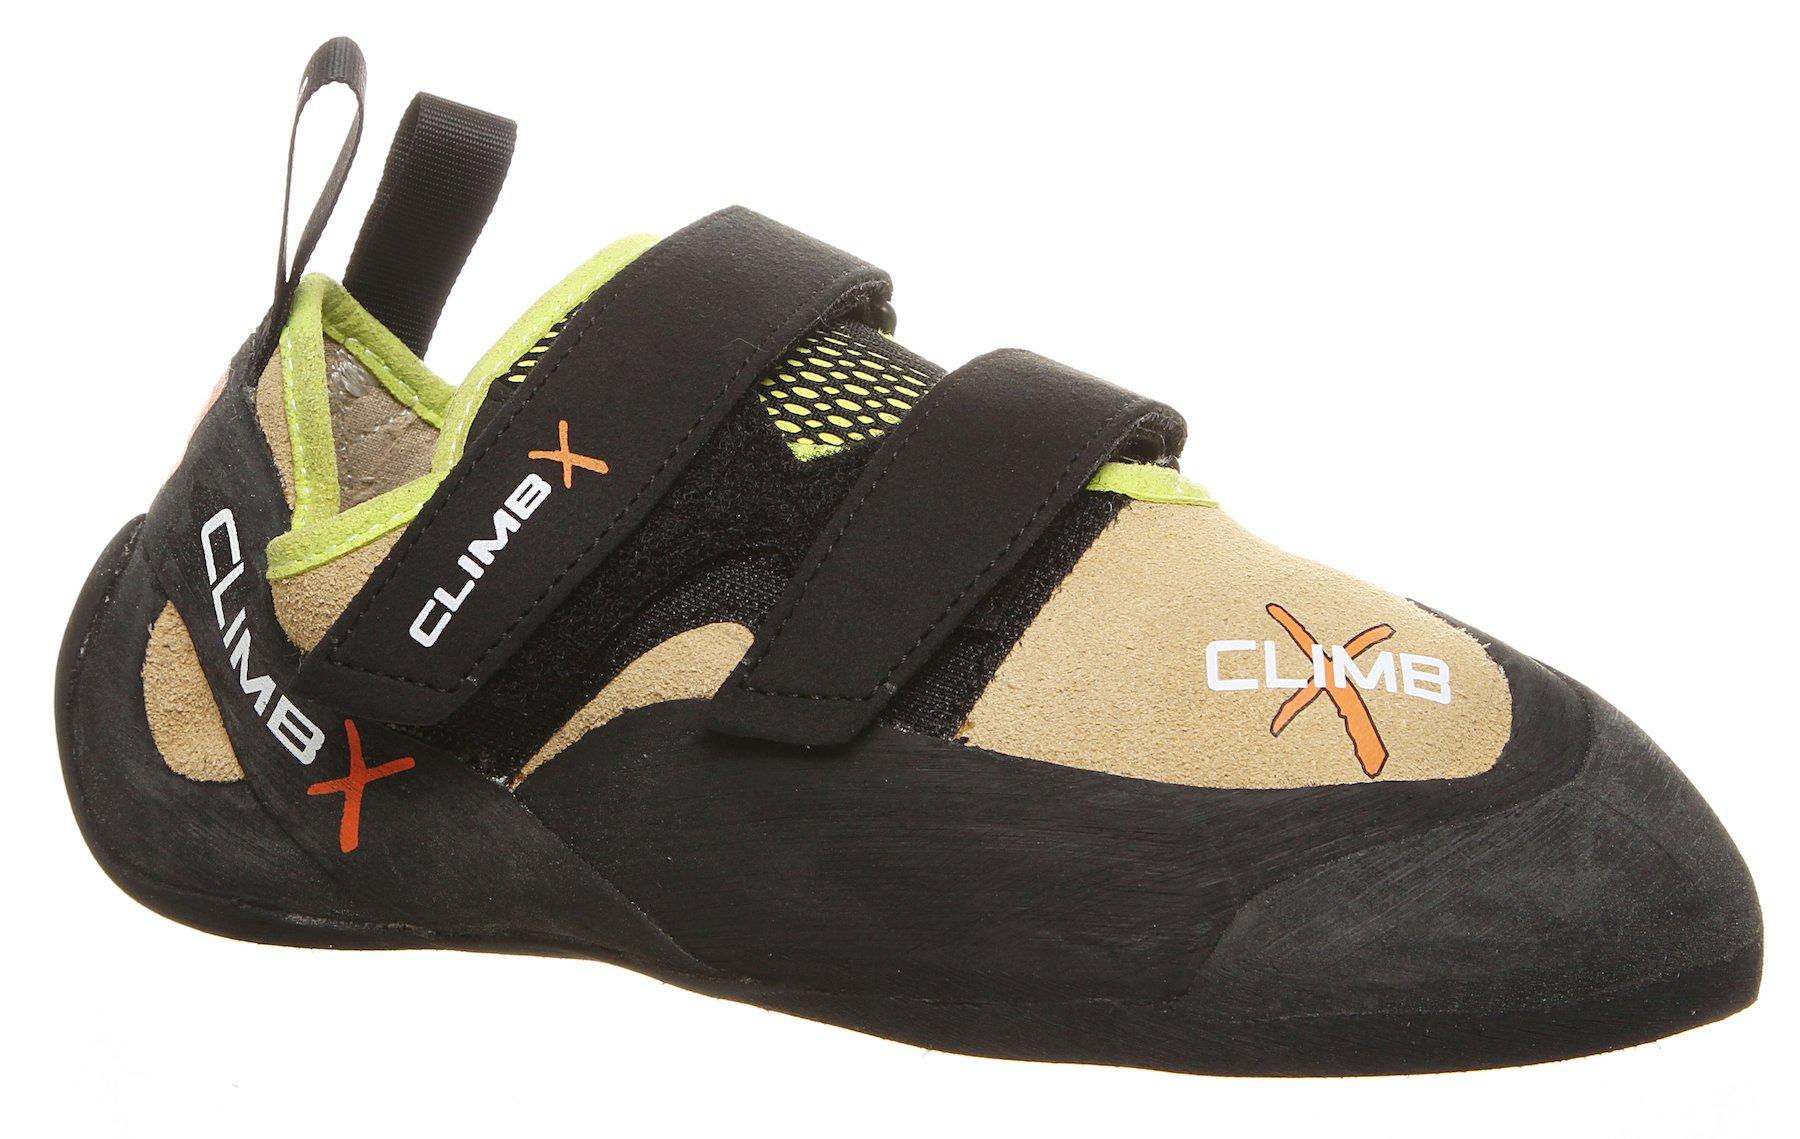 Climb X Rave Trainer Climbing Shoe with Free Sickle M-16 Climbing Brush (Men's 6.5, Tan)